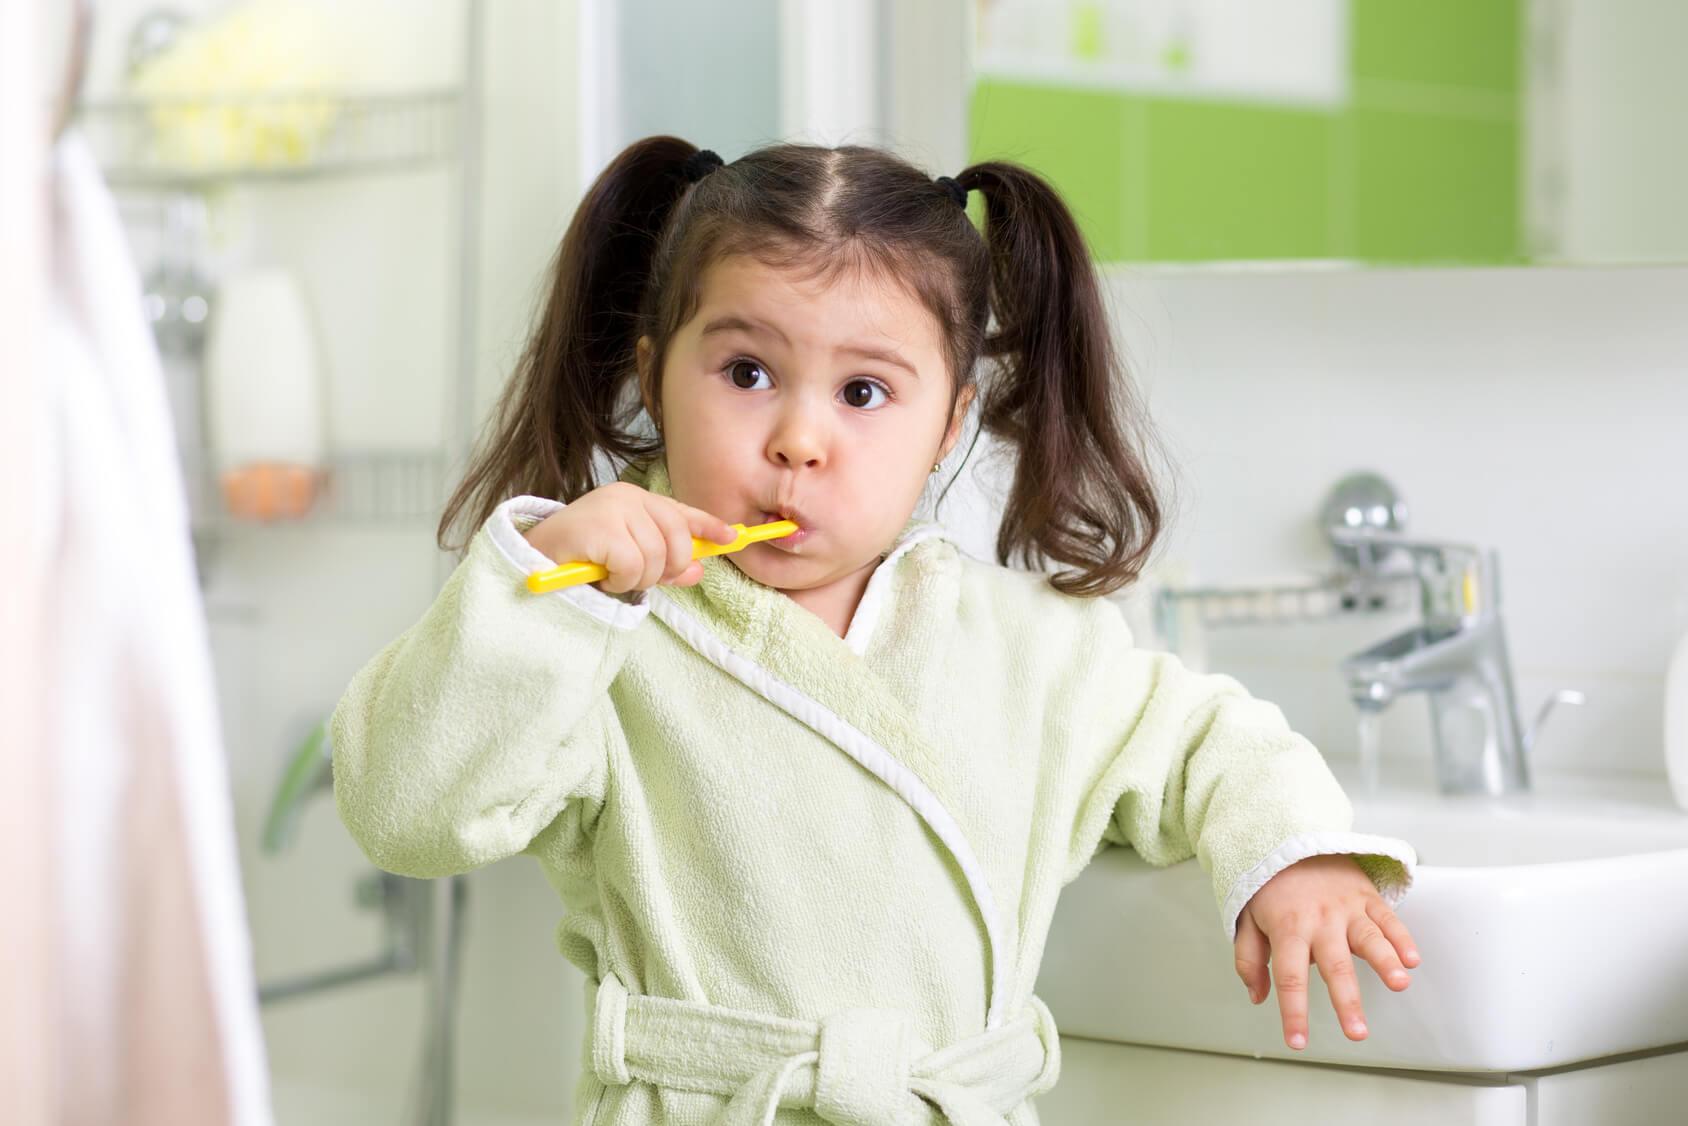 Child little girl brushing teeth in bath